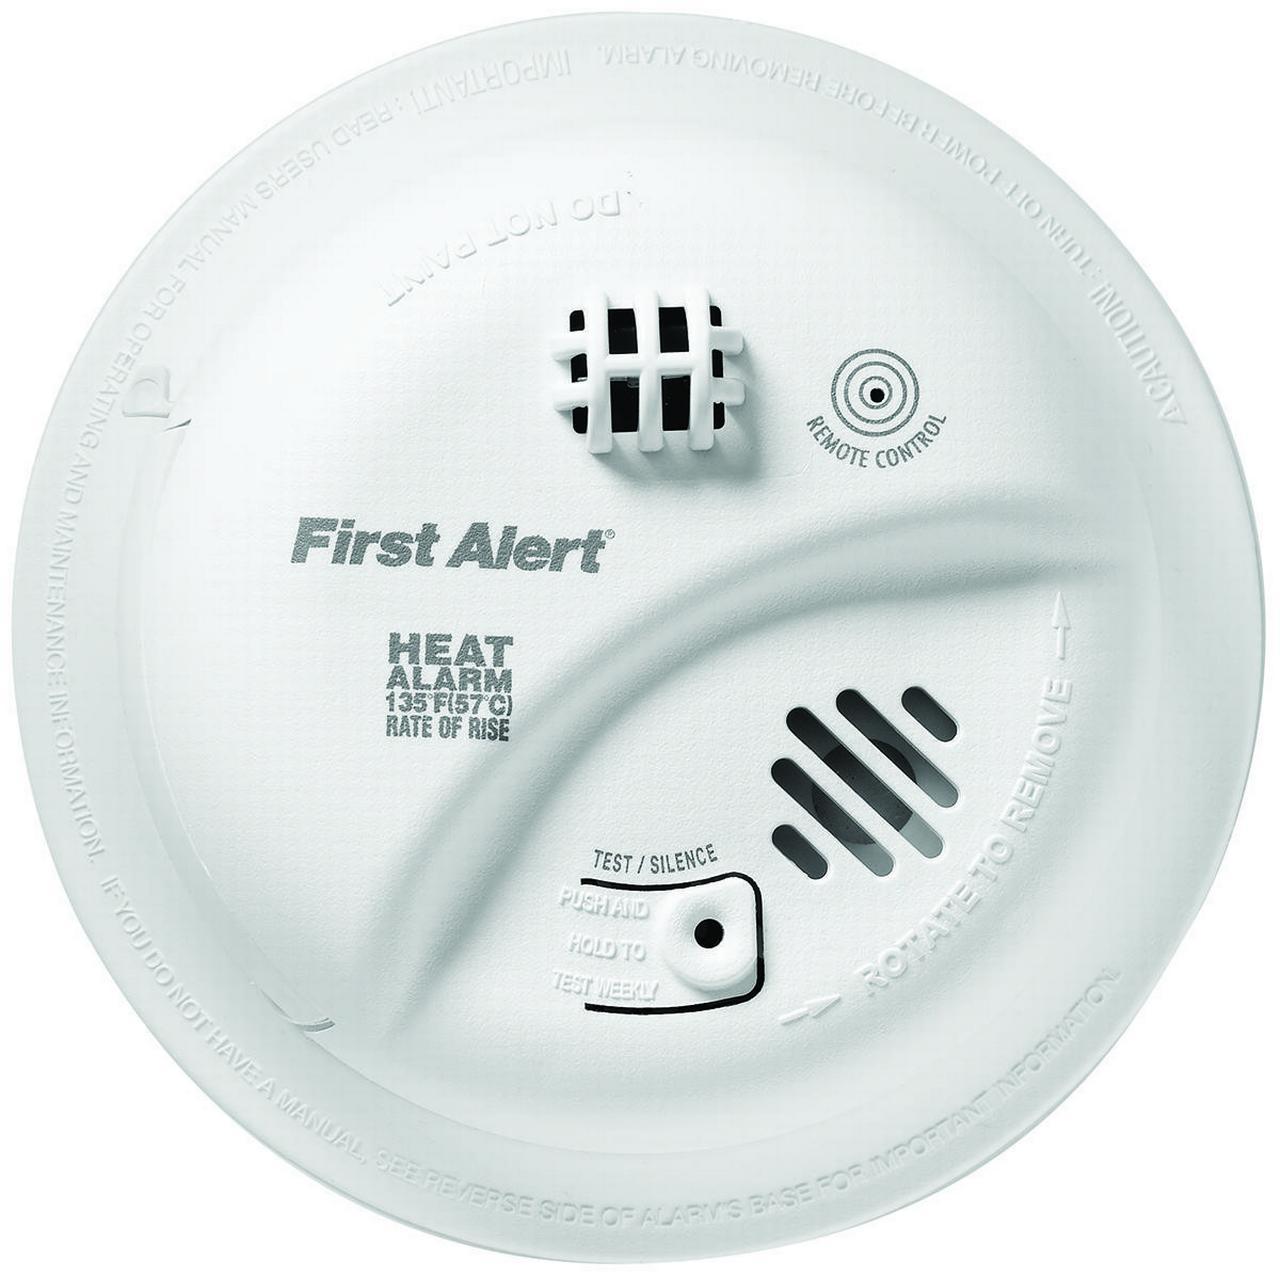 BRK HD6135FB Rate-of-Rise Heat Alarm, 135 deg F, 85 dB, Thermistor LED Display